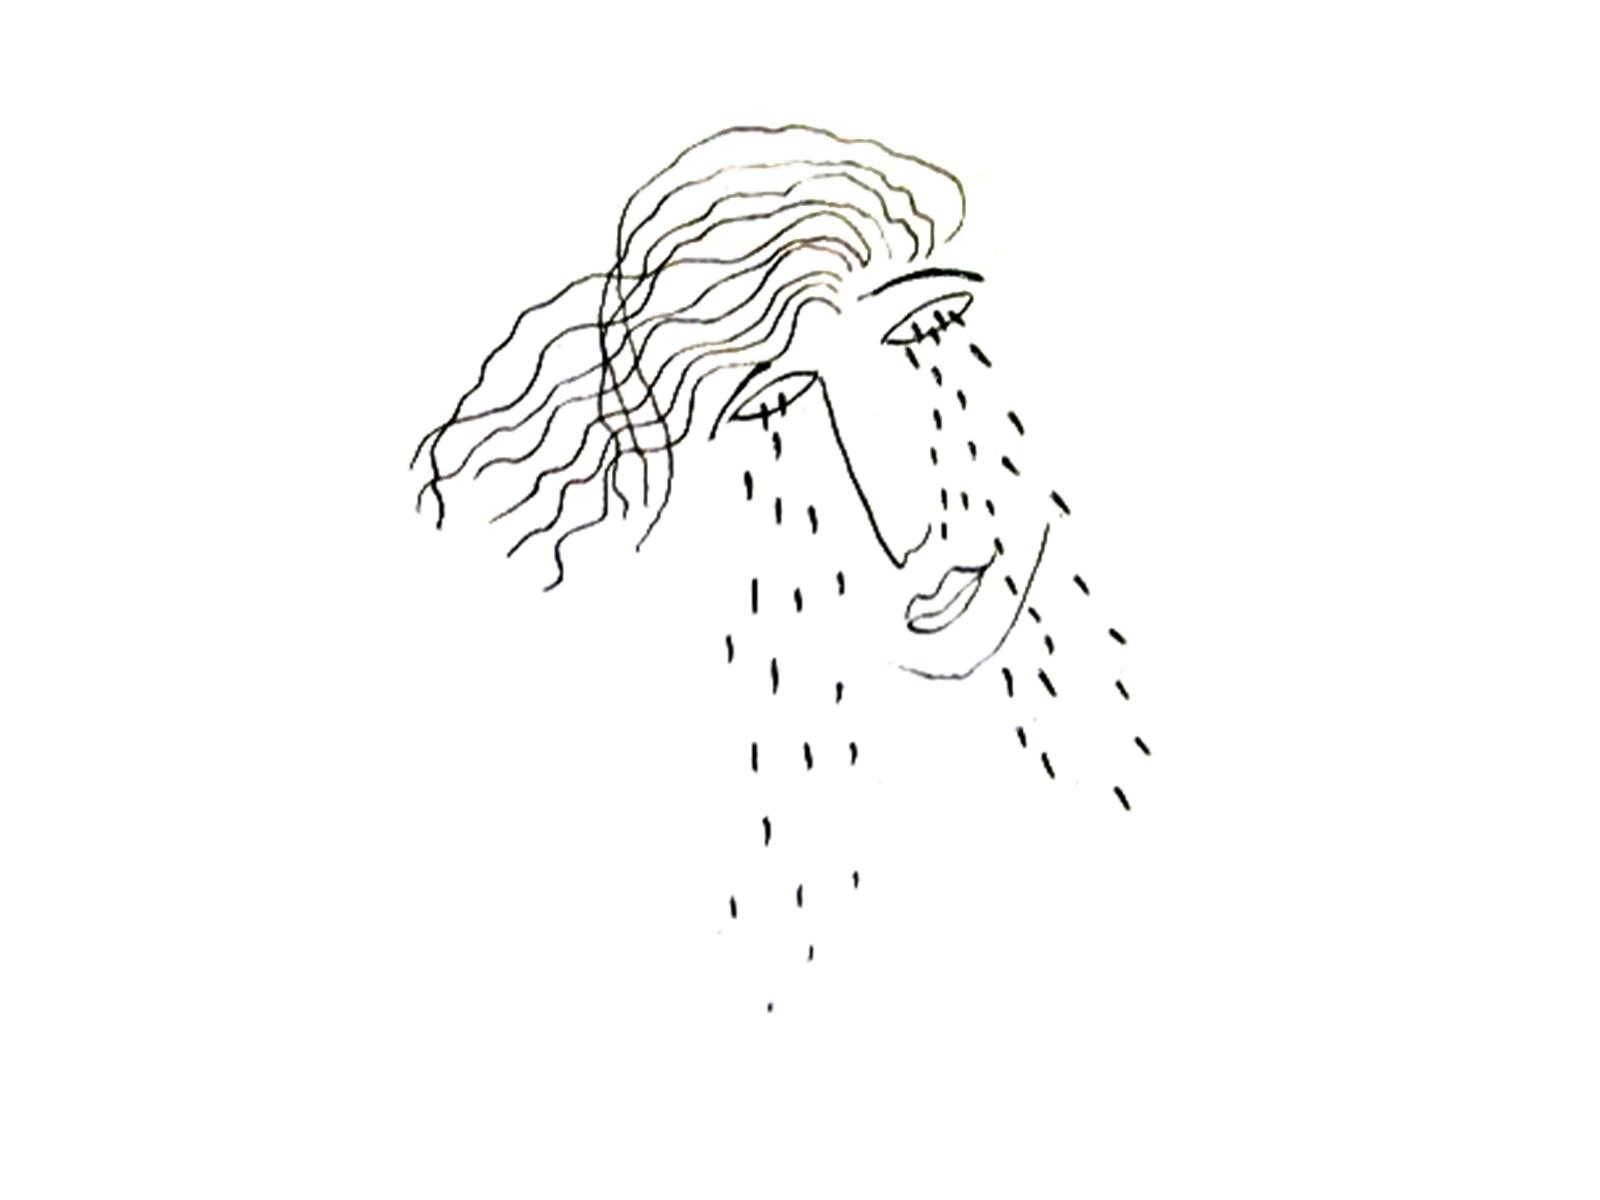 dibujo de F. García Lorca